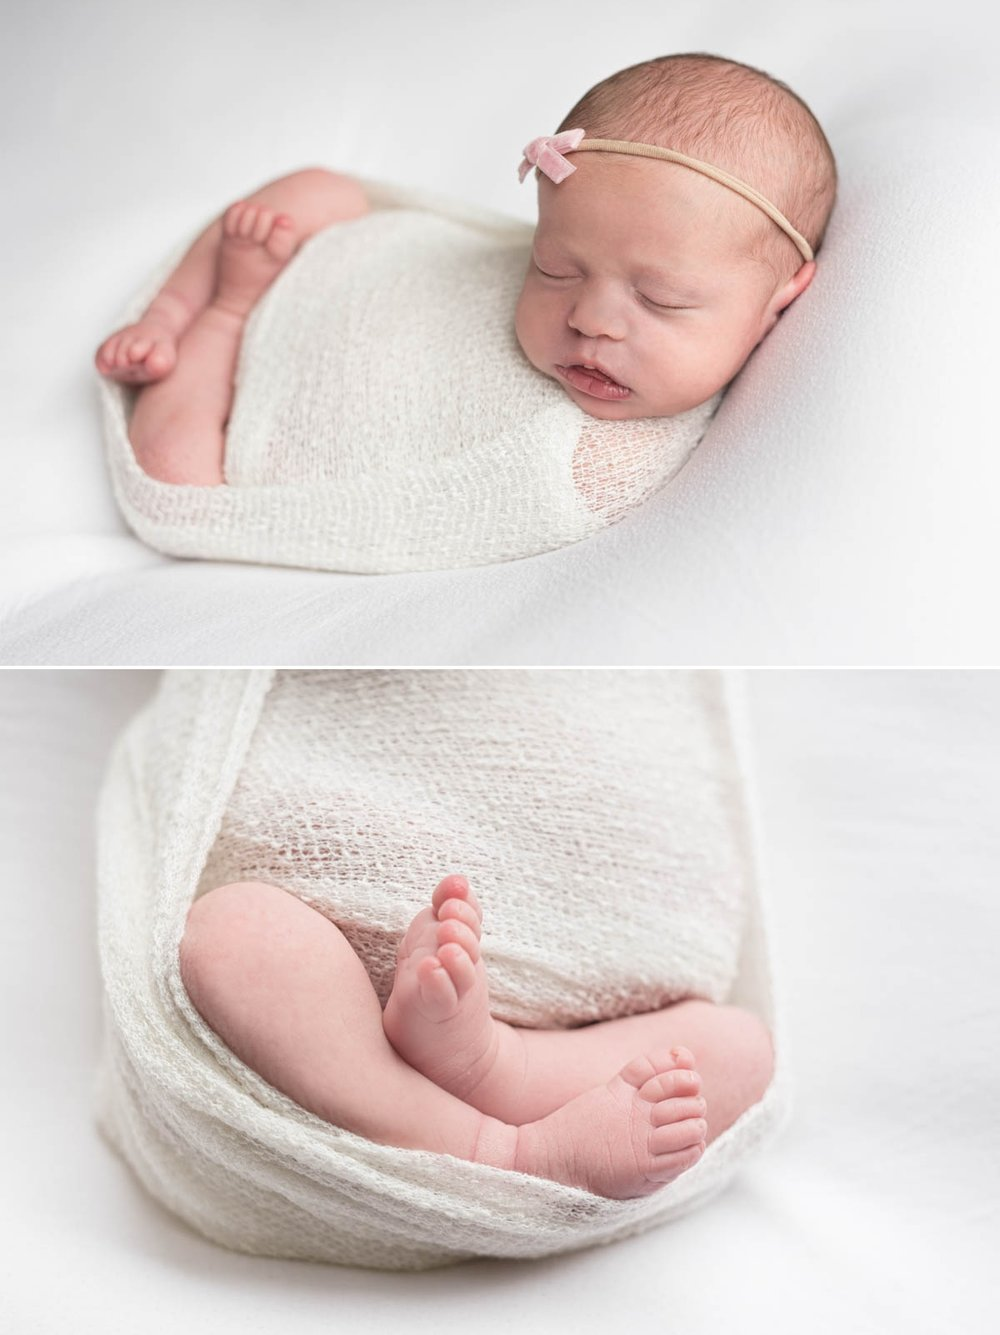 ambler newborn photographer